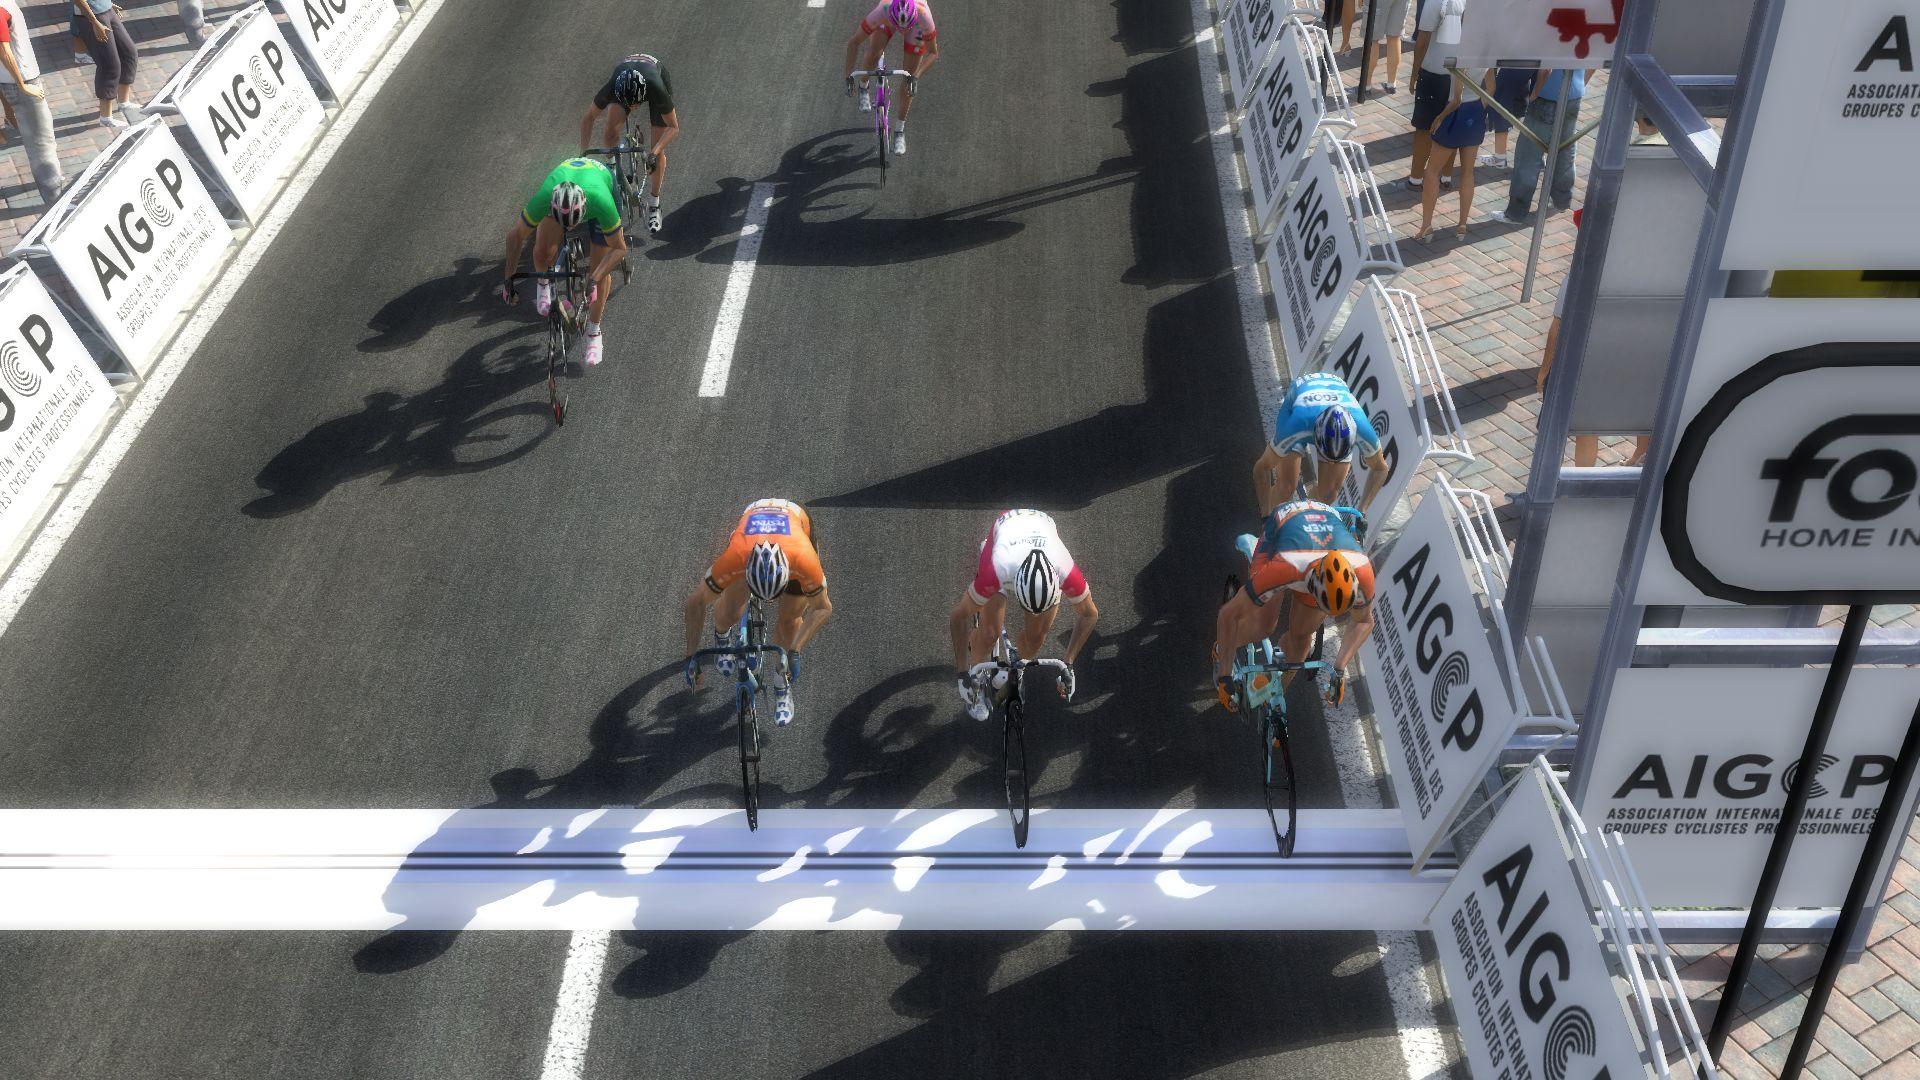 pcmdaily.com/images/mg/2019/Races/PT/Tirreno/mg19_ta_s07_26.jpg